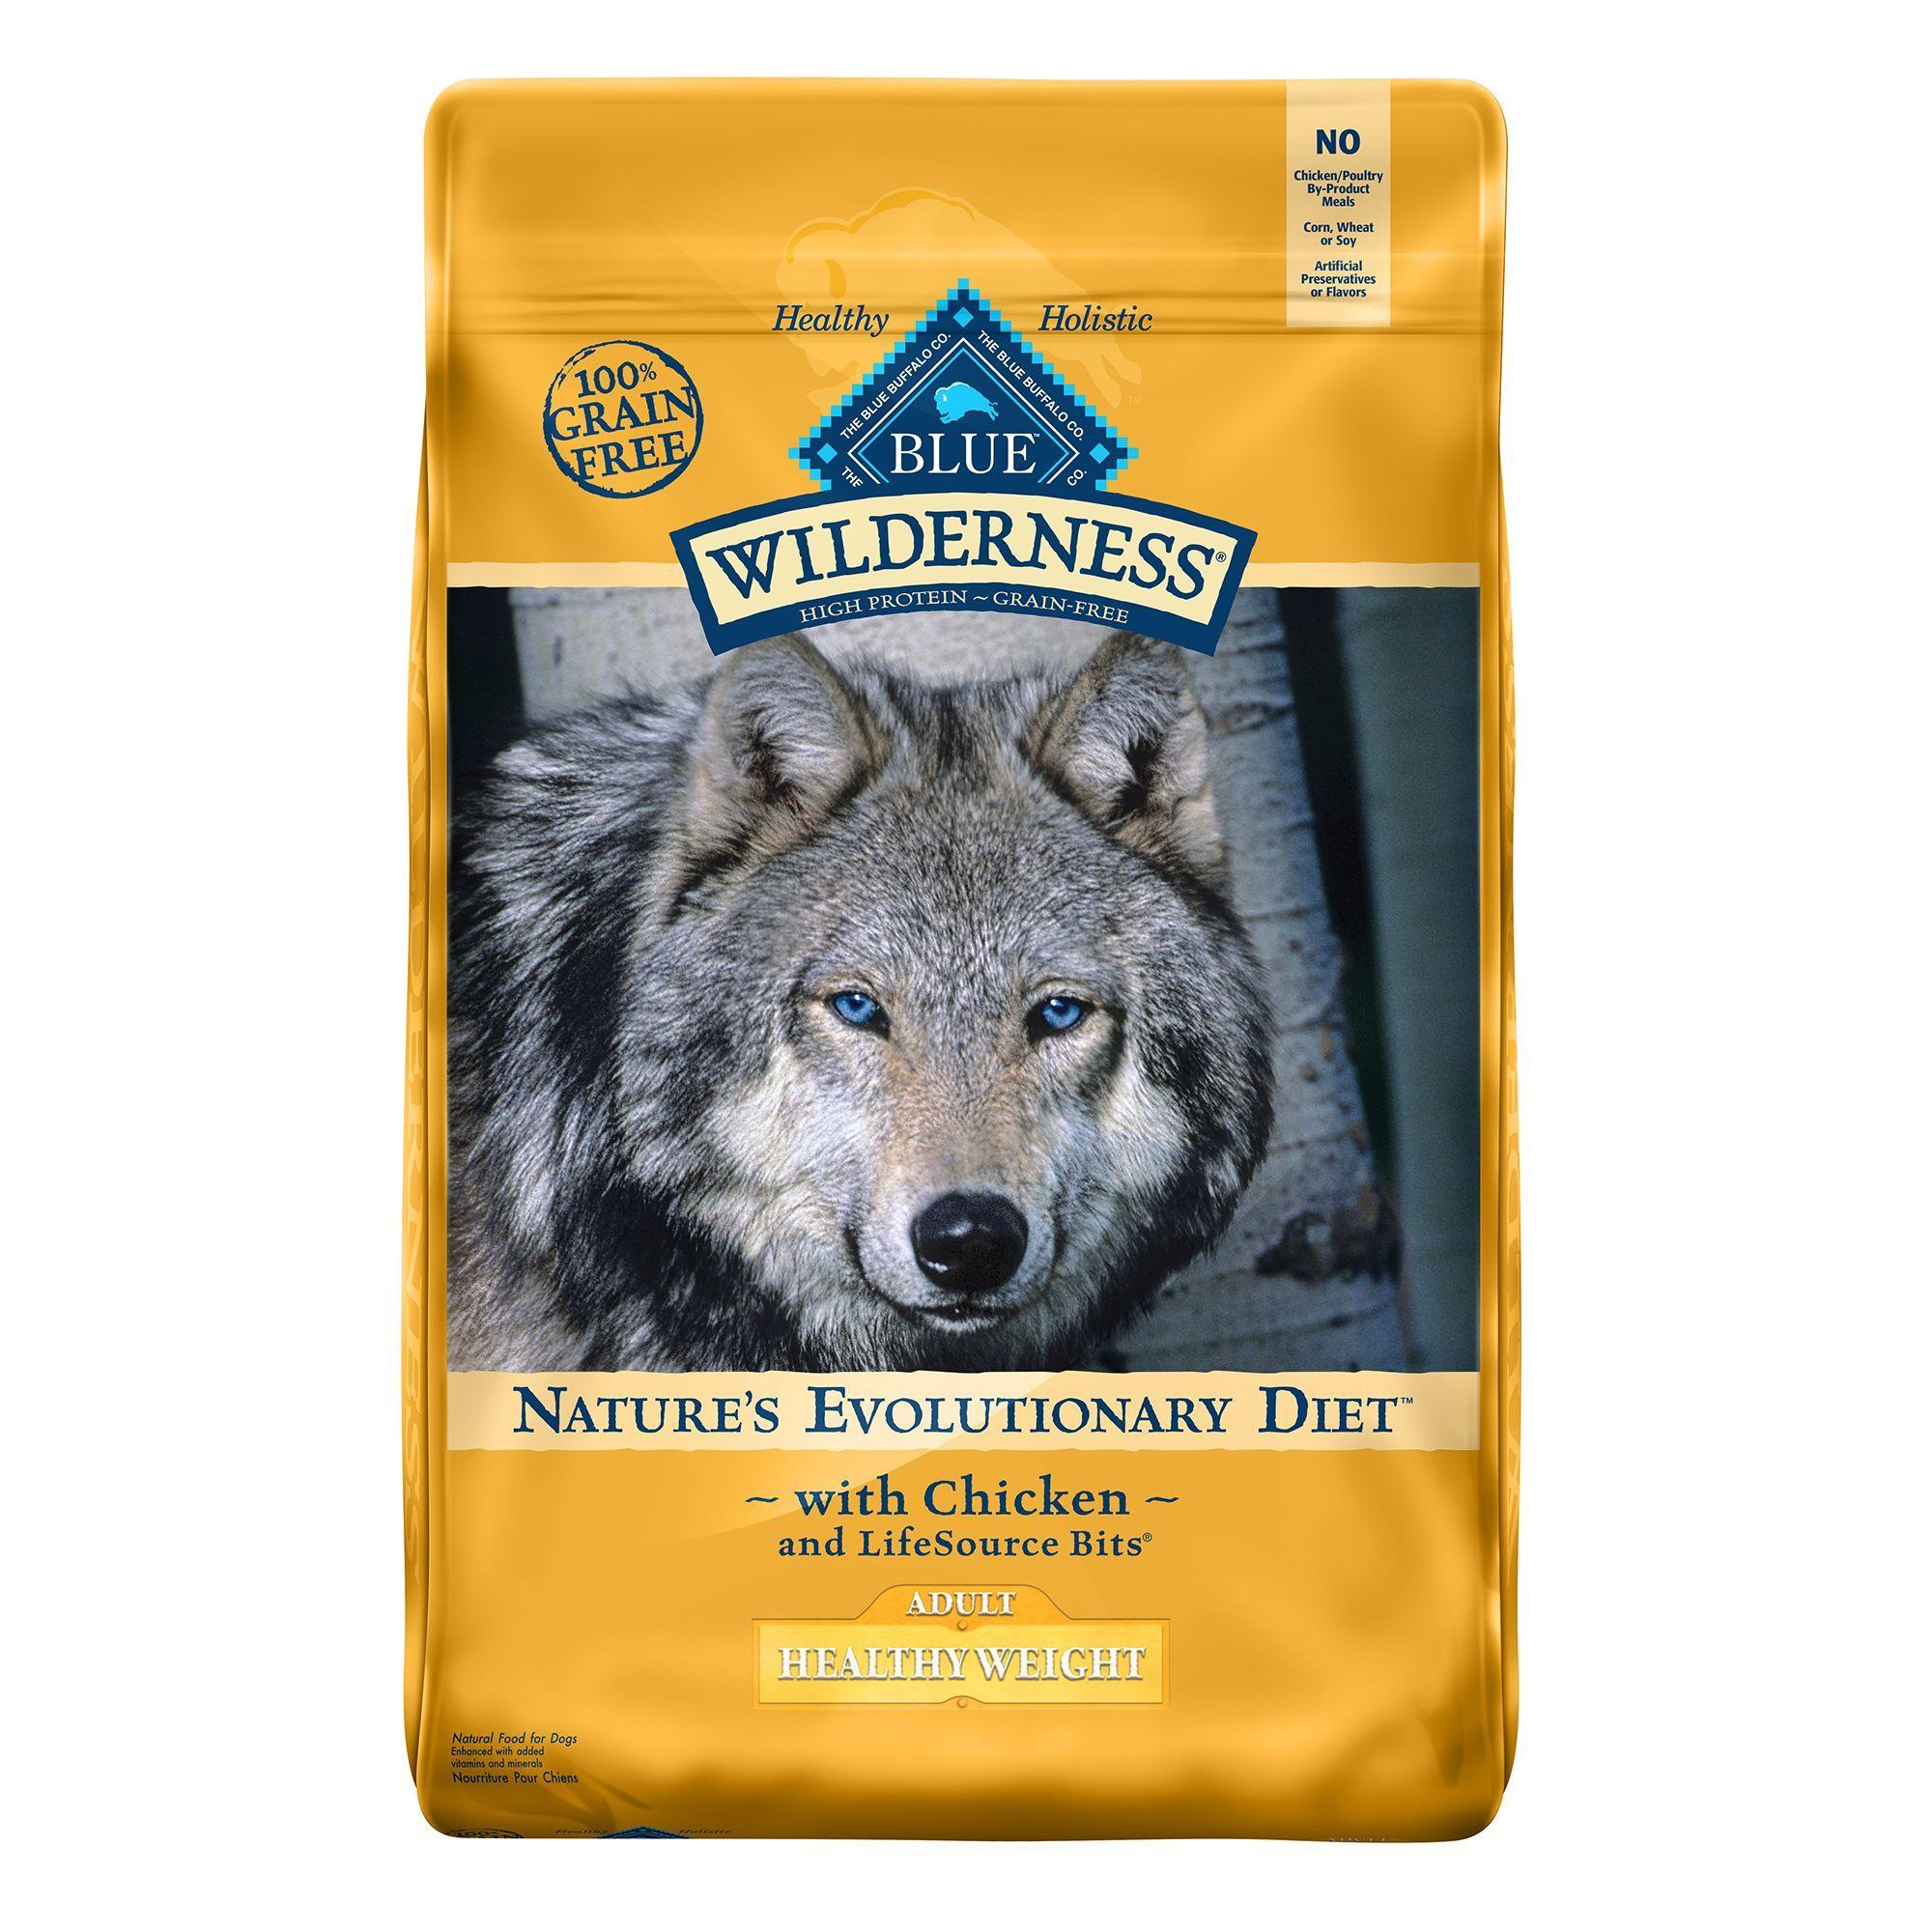 Free can of blue buffalo wet dog food at petsmart free product.